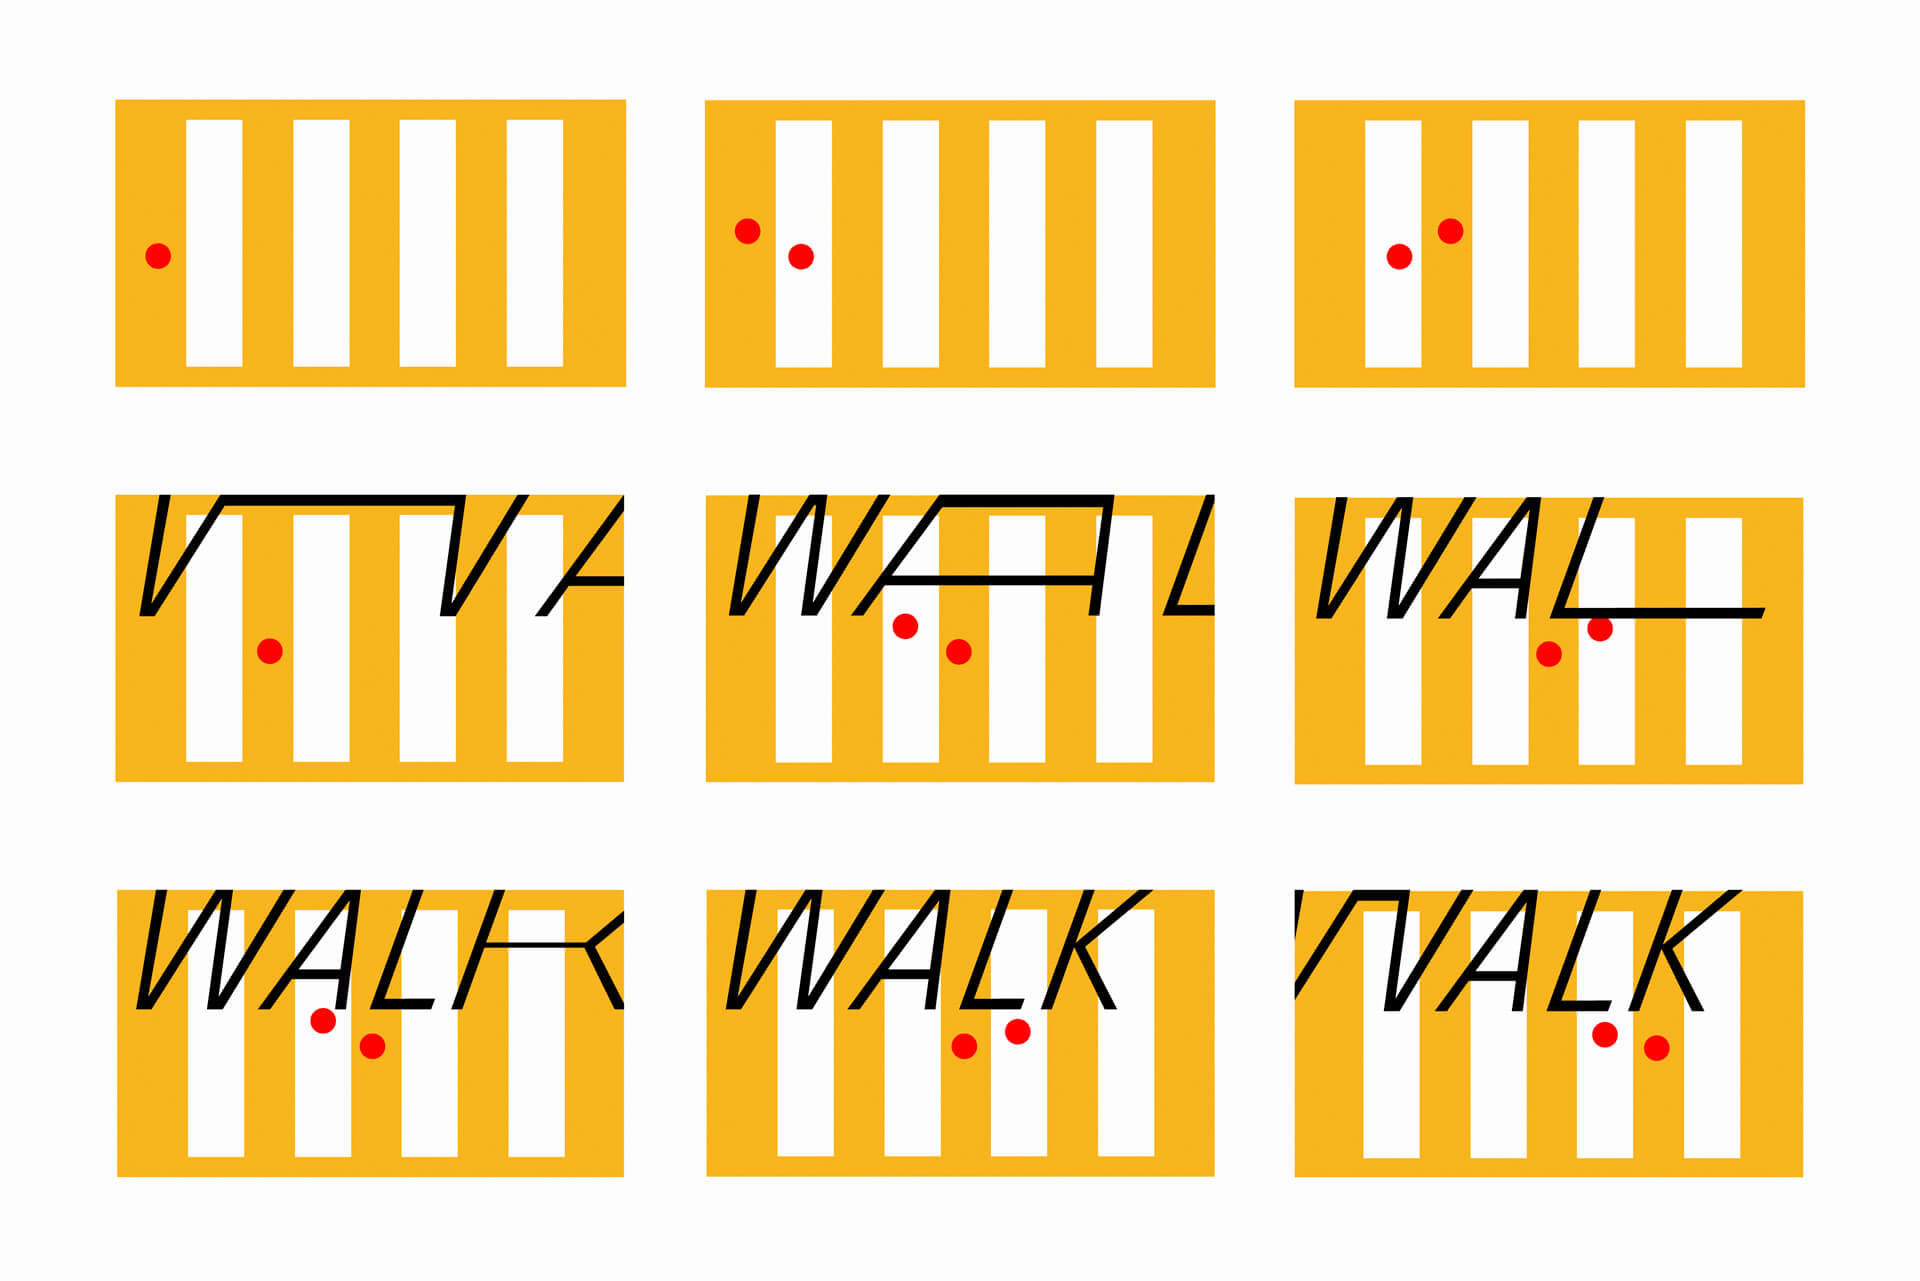 walk_1